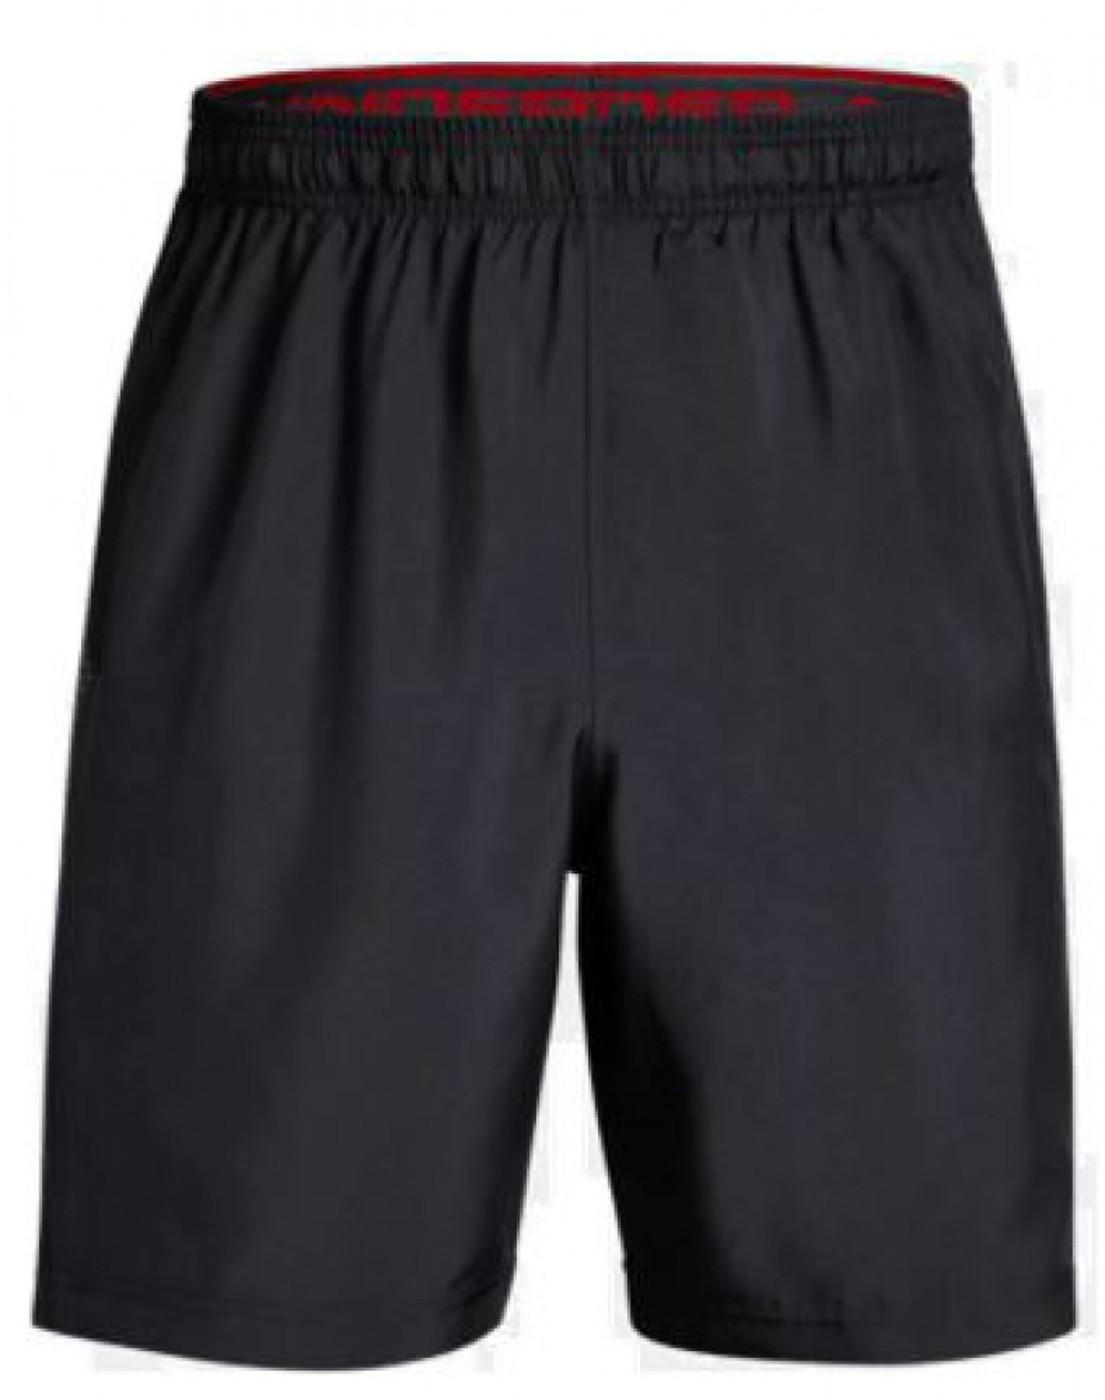 UNDER ARMOUR UA Woven Graphic Shorts - Herren